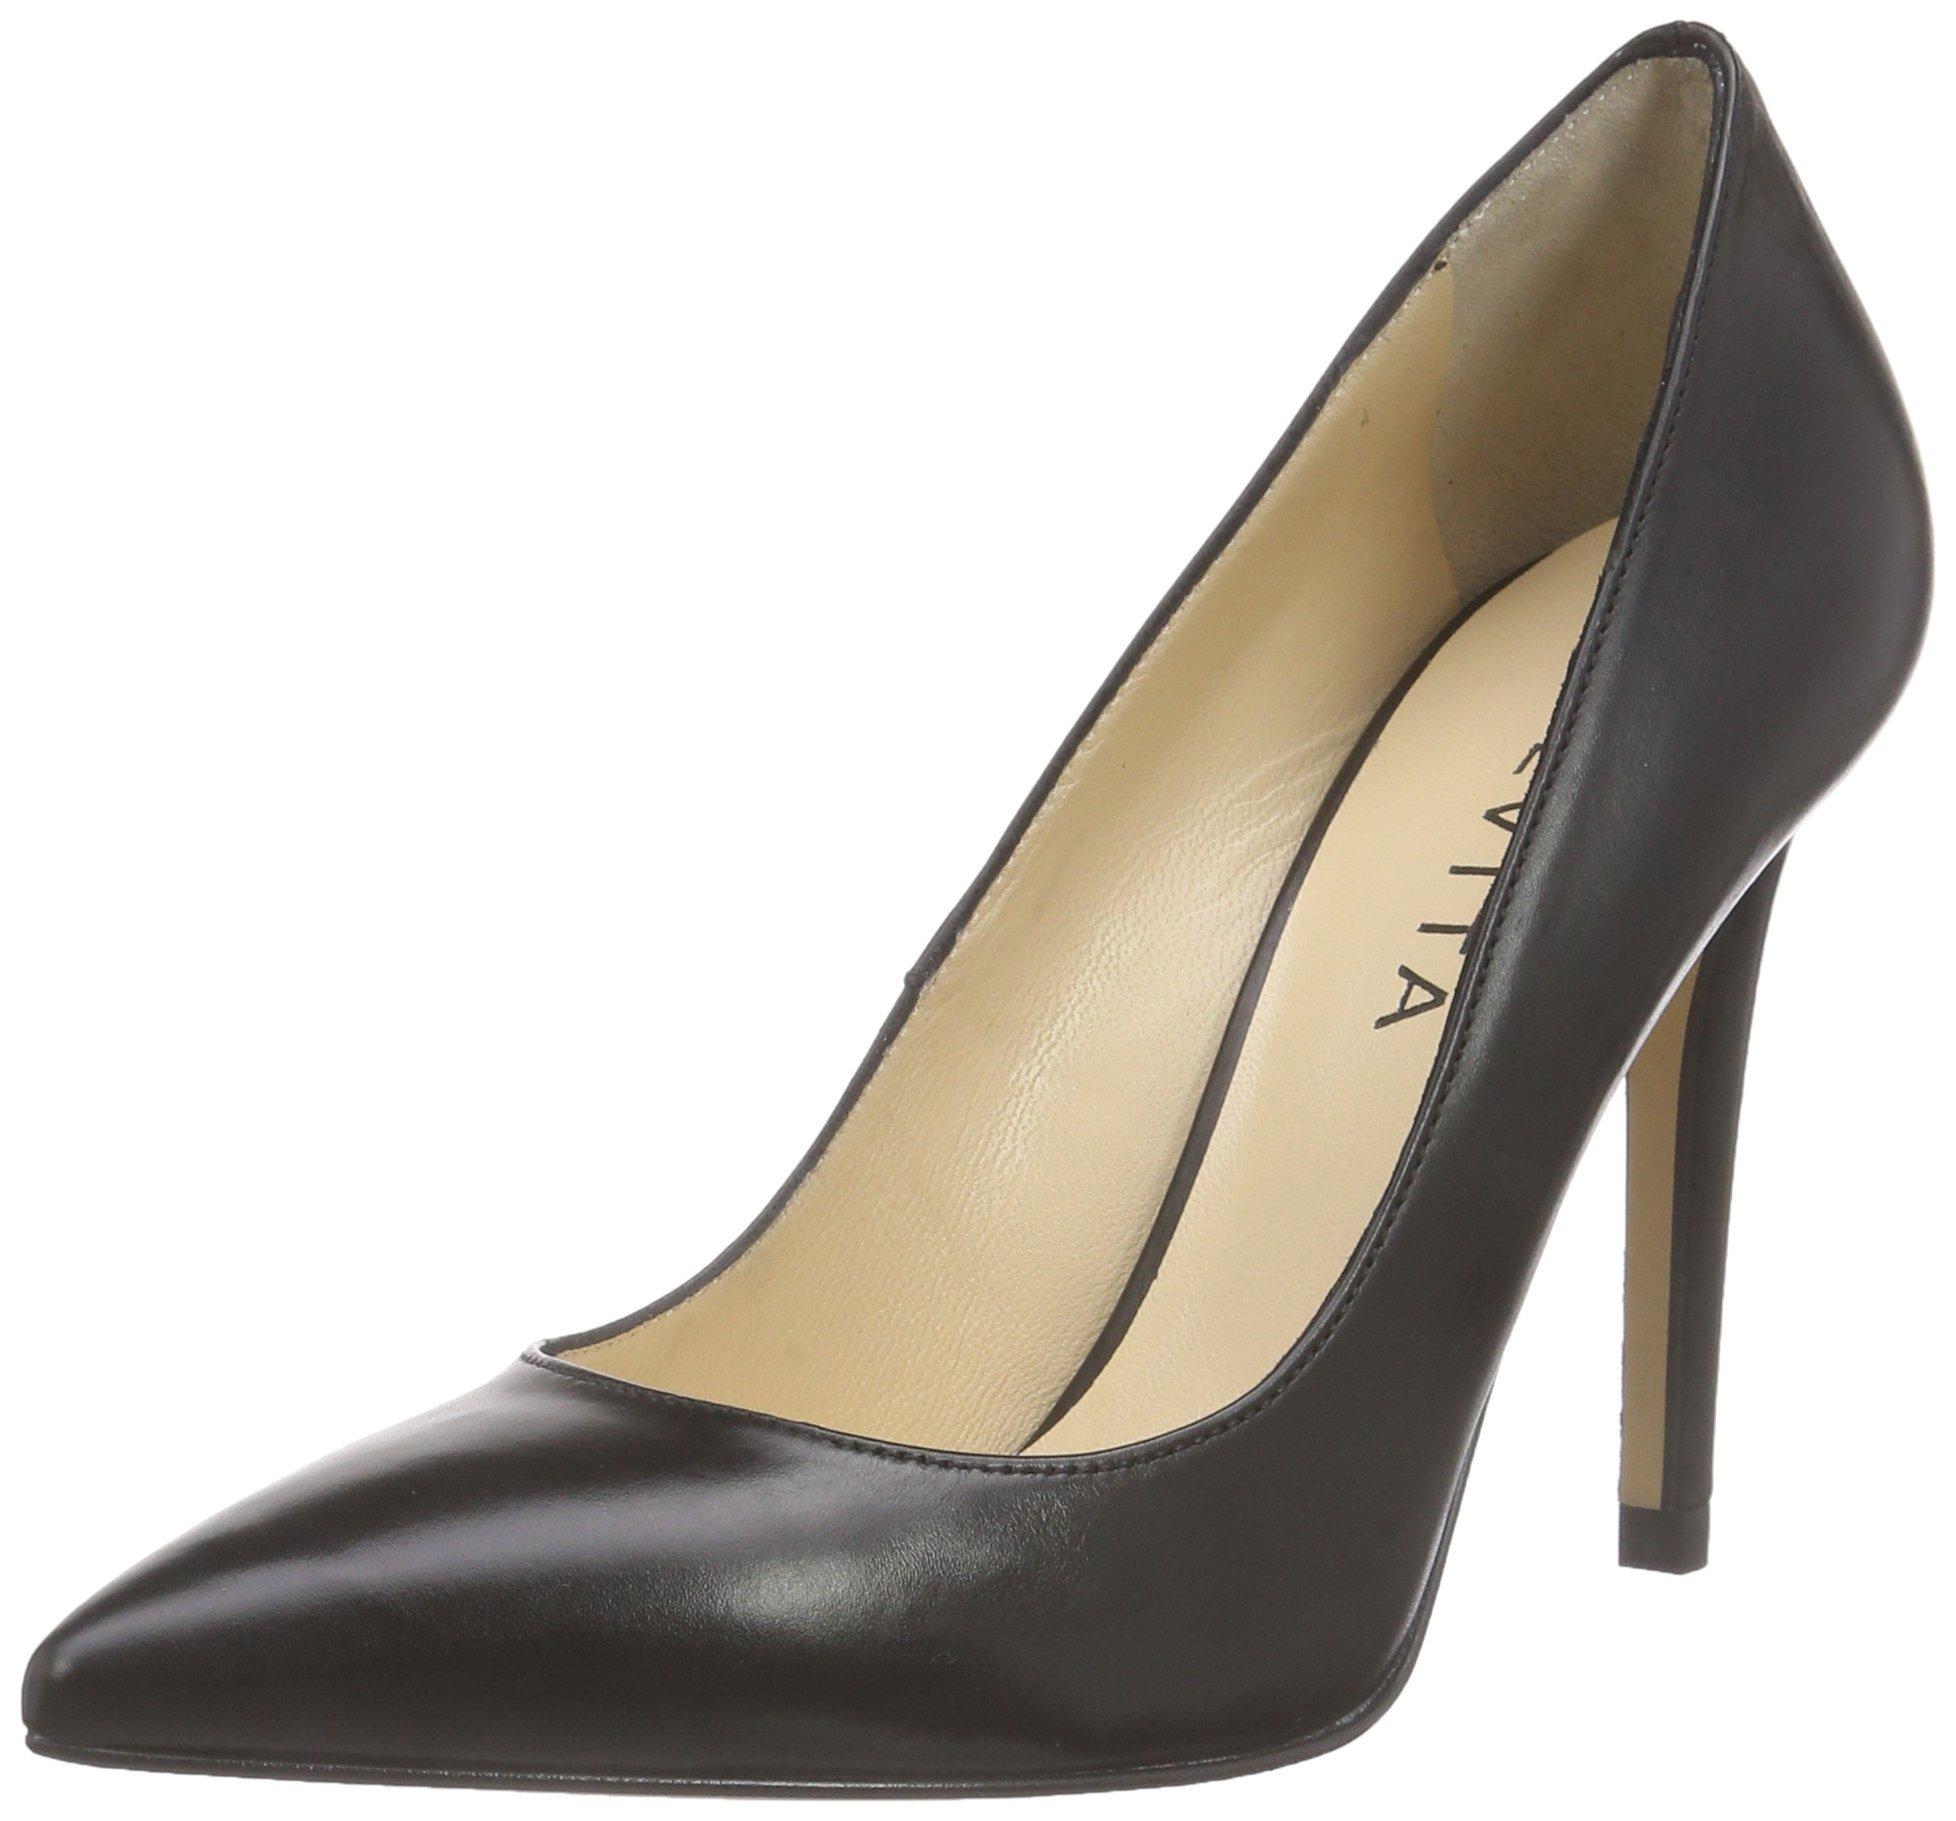 Evita Fermé 1039 Shoes PumpEscarpins FemmeNoirschwarz Bout Eu LMVpGqSUz